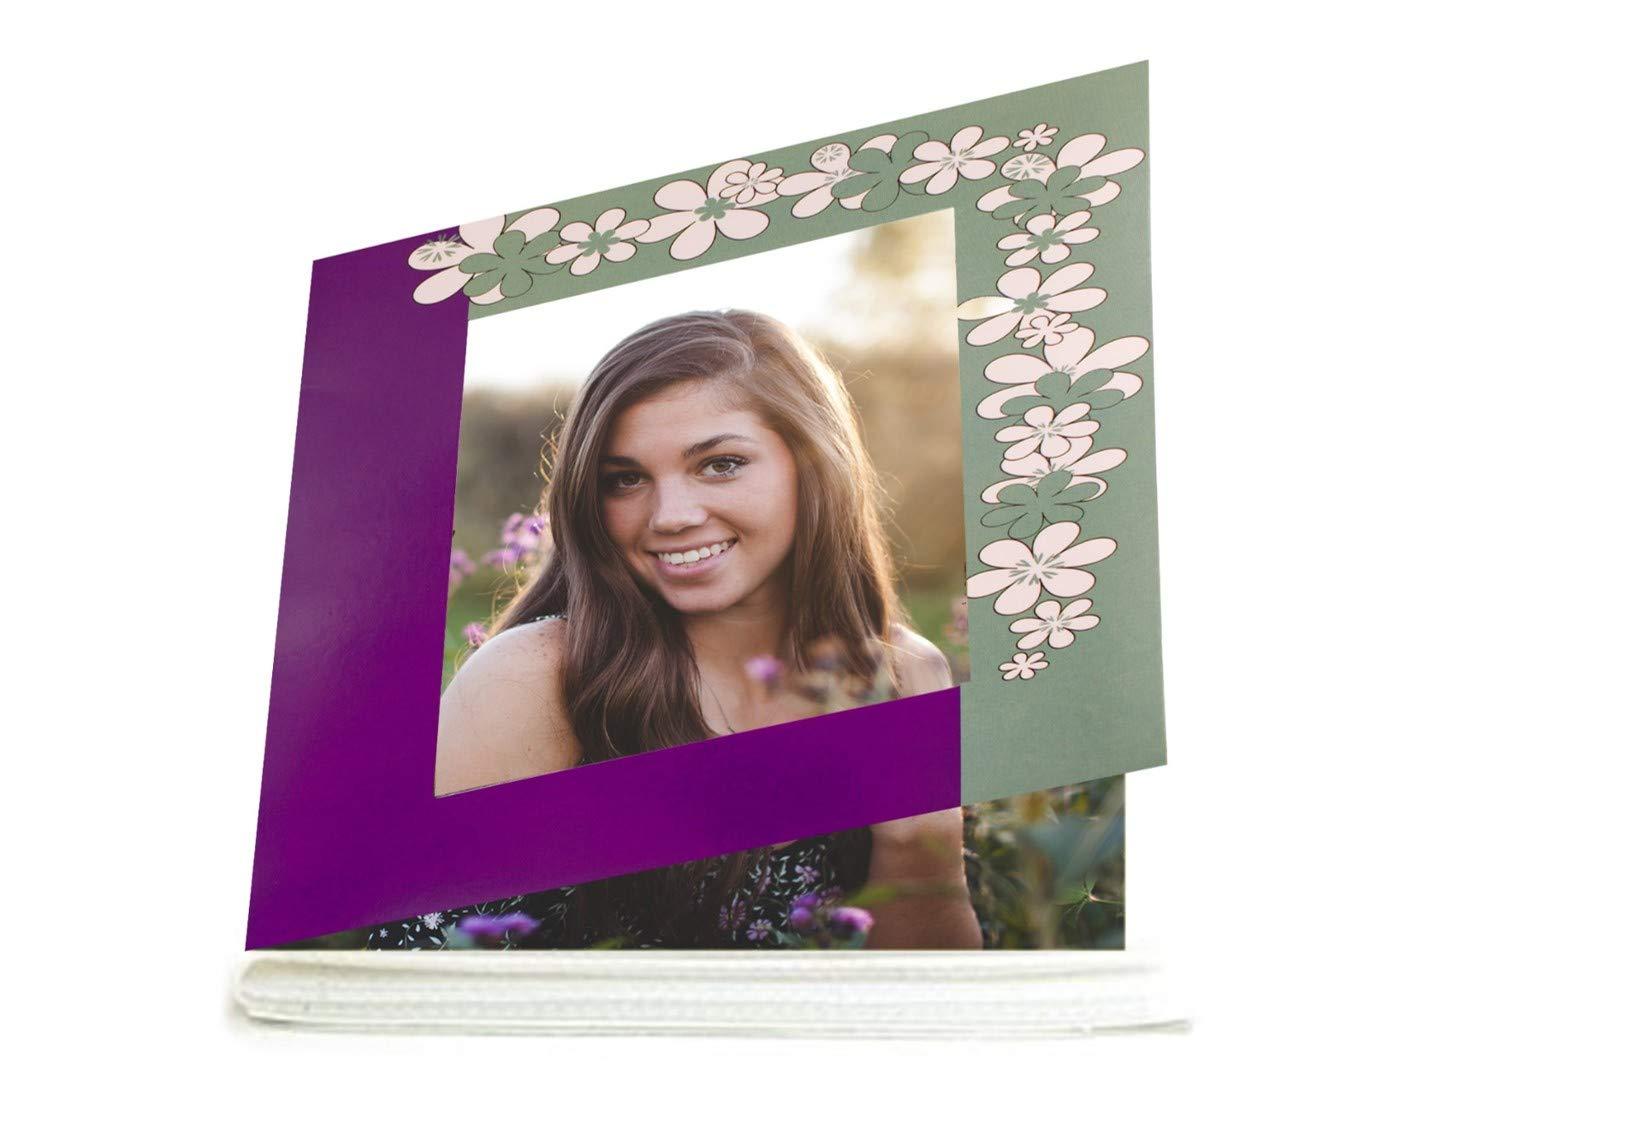 KVD Albums Mini 4x6 Photo Album Brag Book, Various Exquisite Colors and Themes, Durable, Flexible, Holds 36 4 x 6 Photos. Purple/Green Floral by KVD Albums (Image #2)